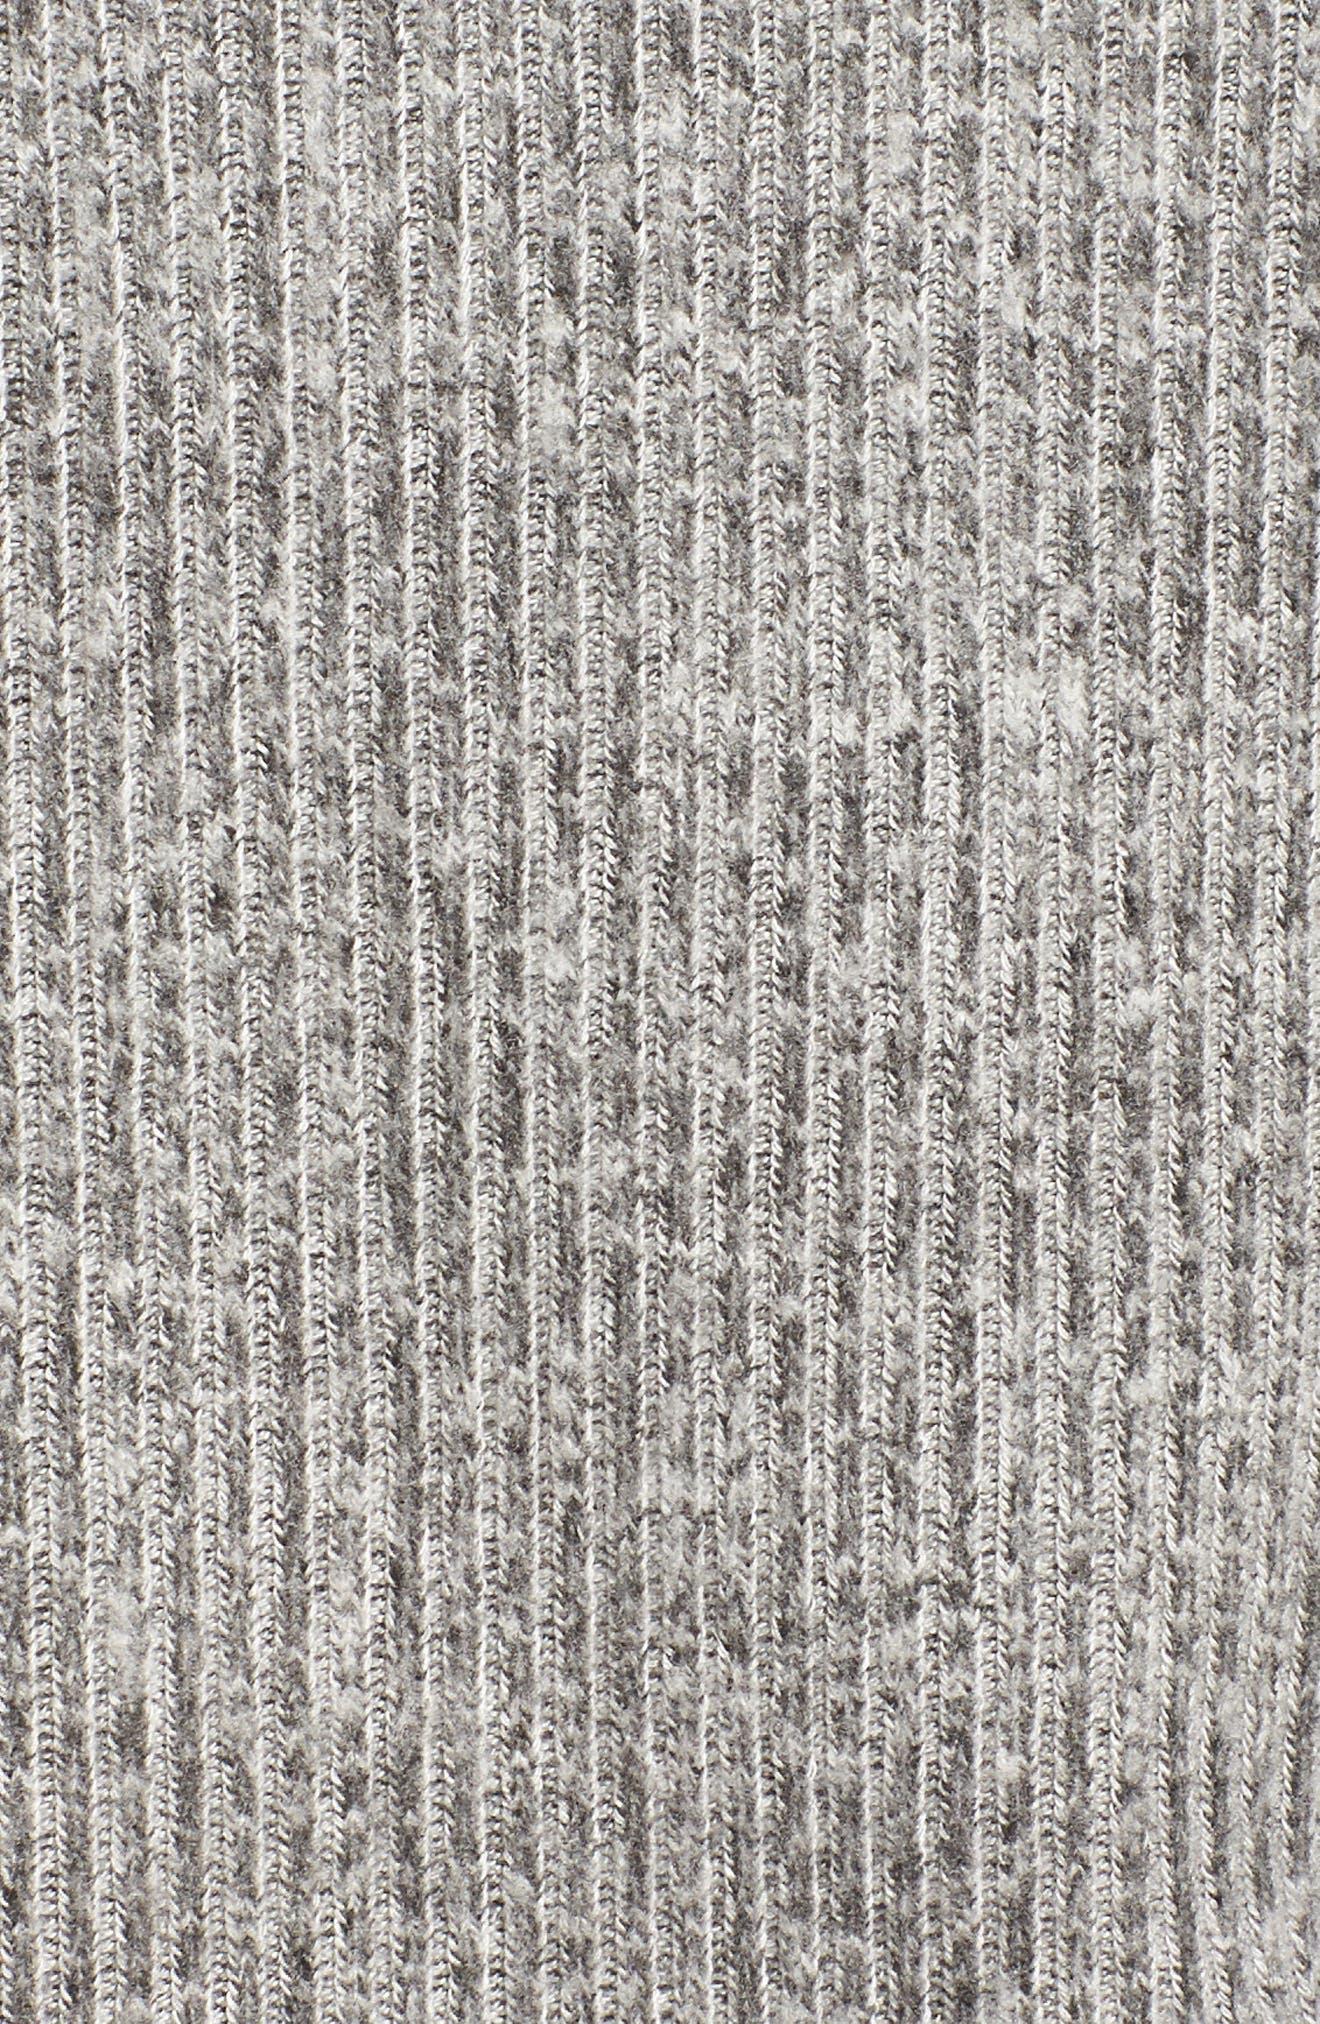 Glenda Sweatshirt,                             Alternate thumbnail 5, color,                             020